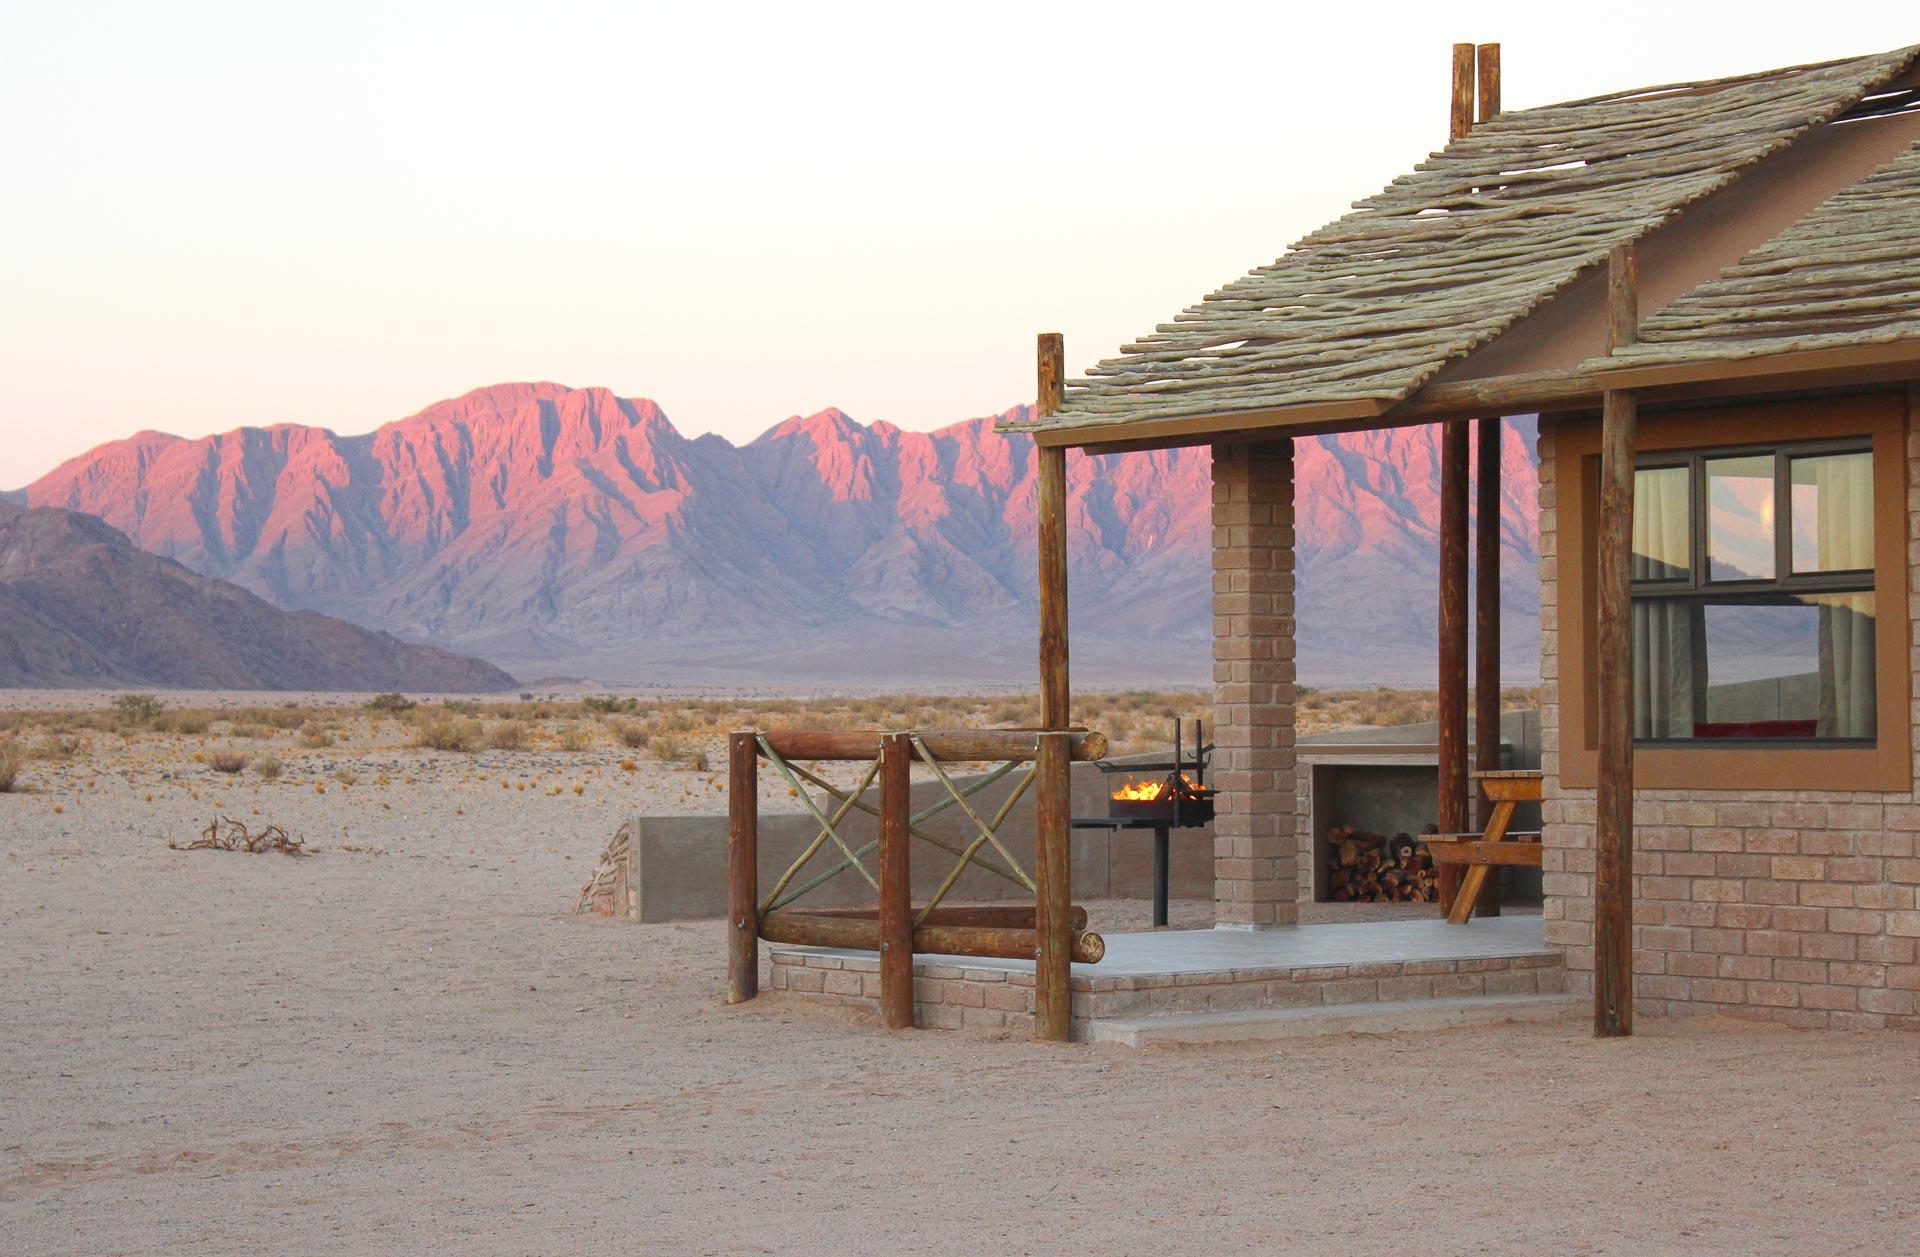 Desert-Camp-Namibia-5